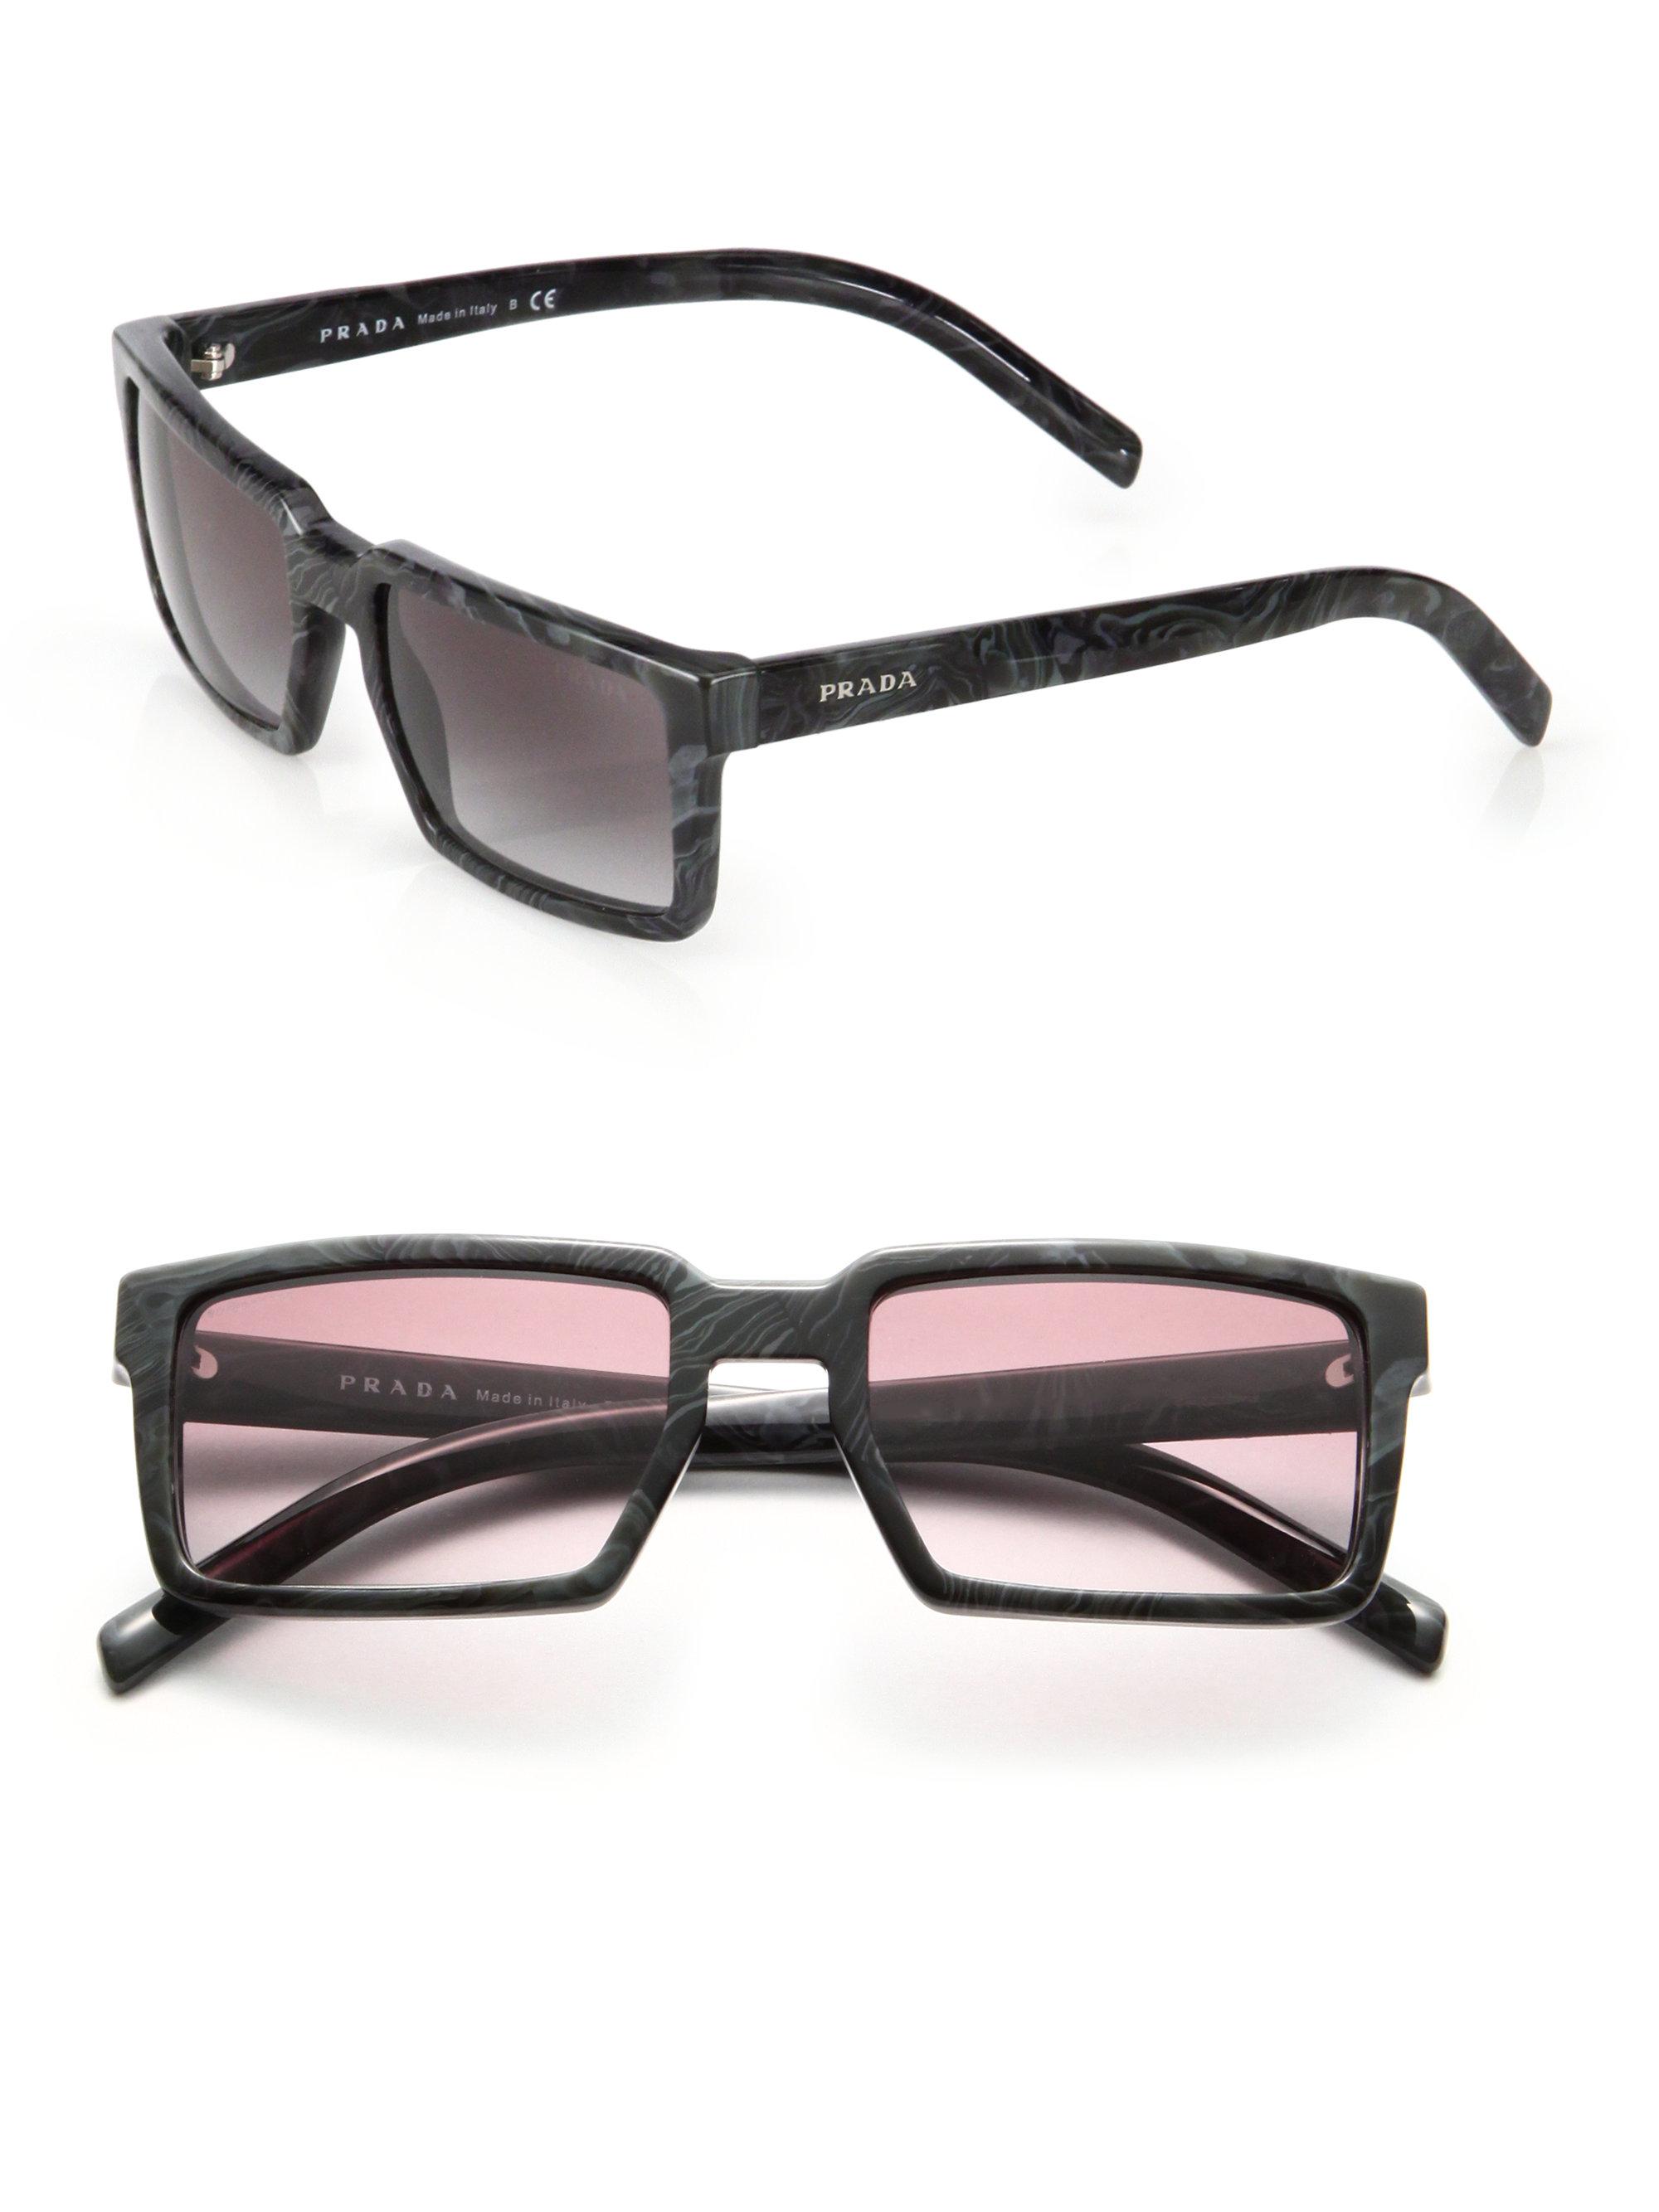 b276235dea1 ... reduced lyst prada 54mm rectangle acetate sunglasses in black for men  39123 7017f